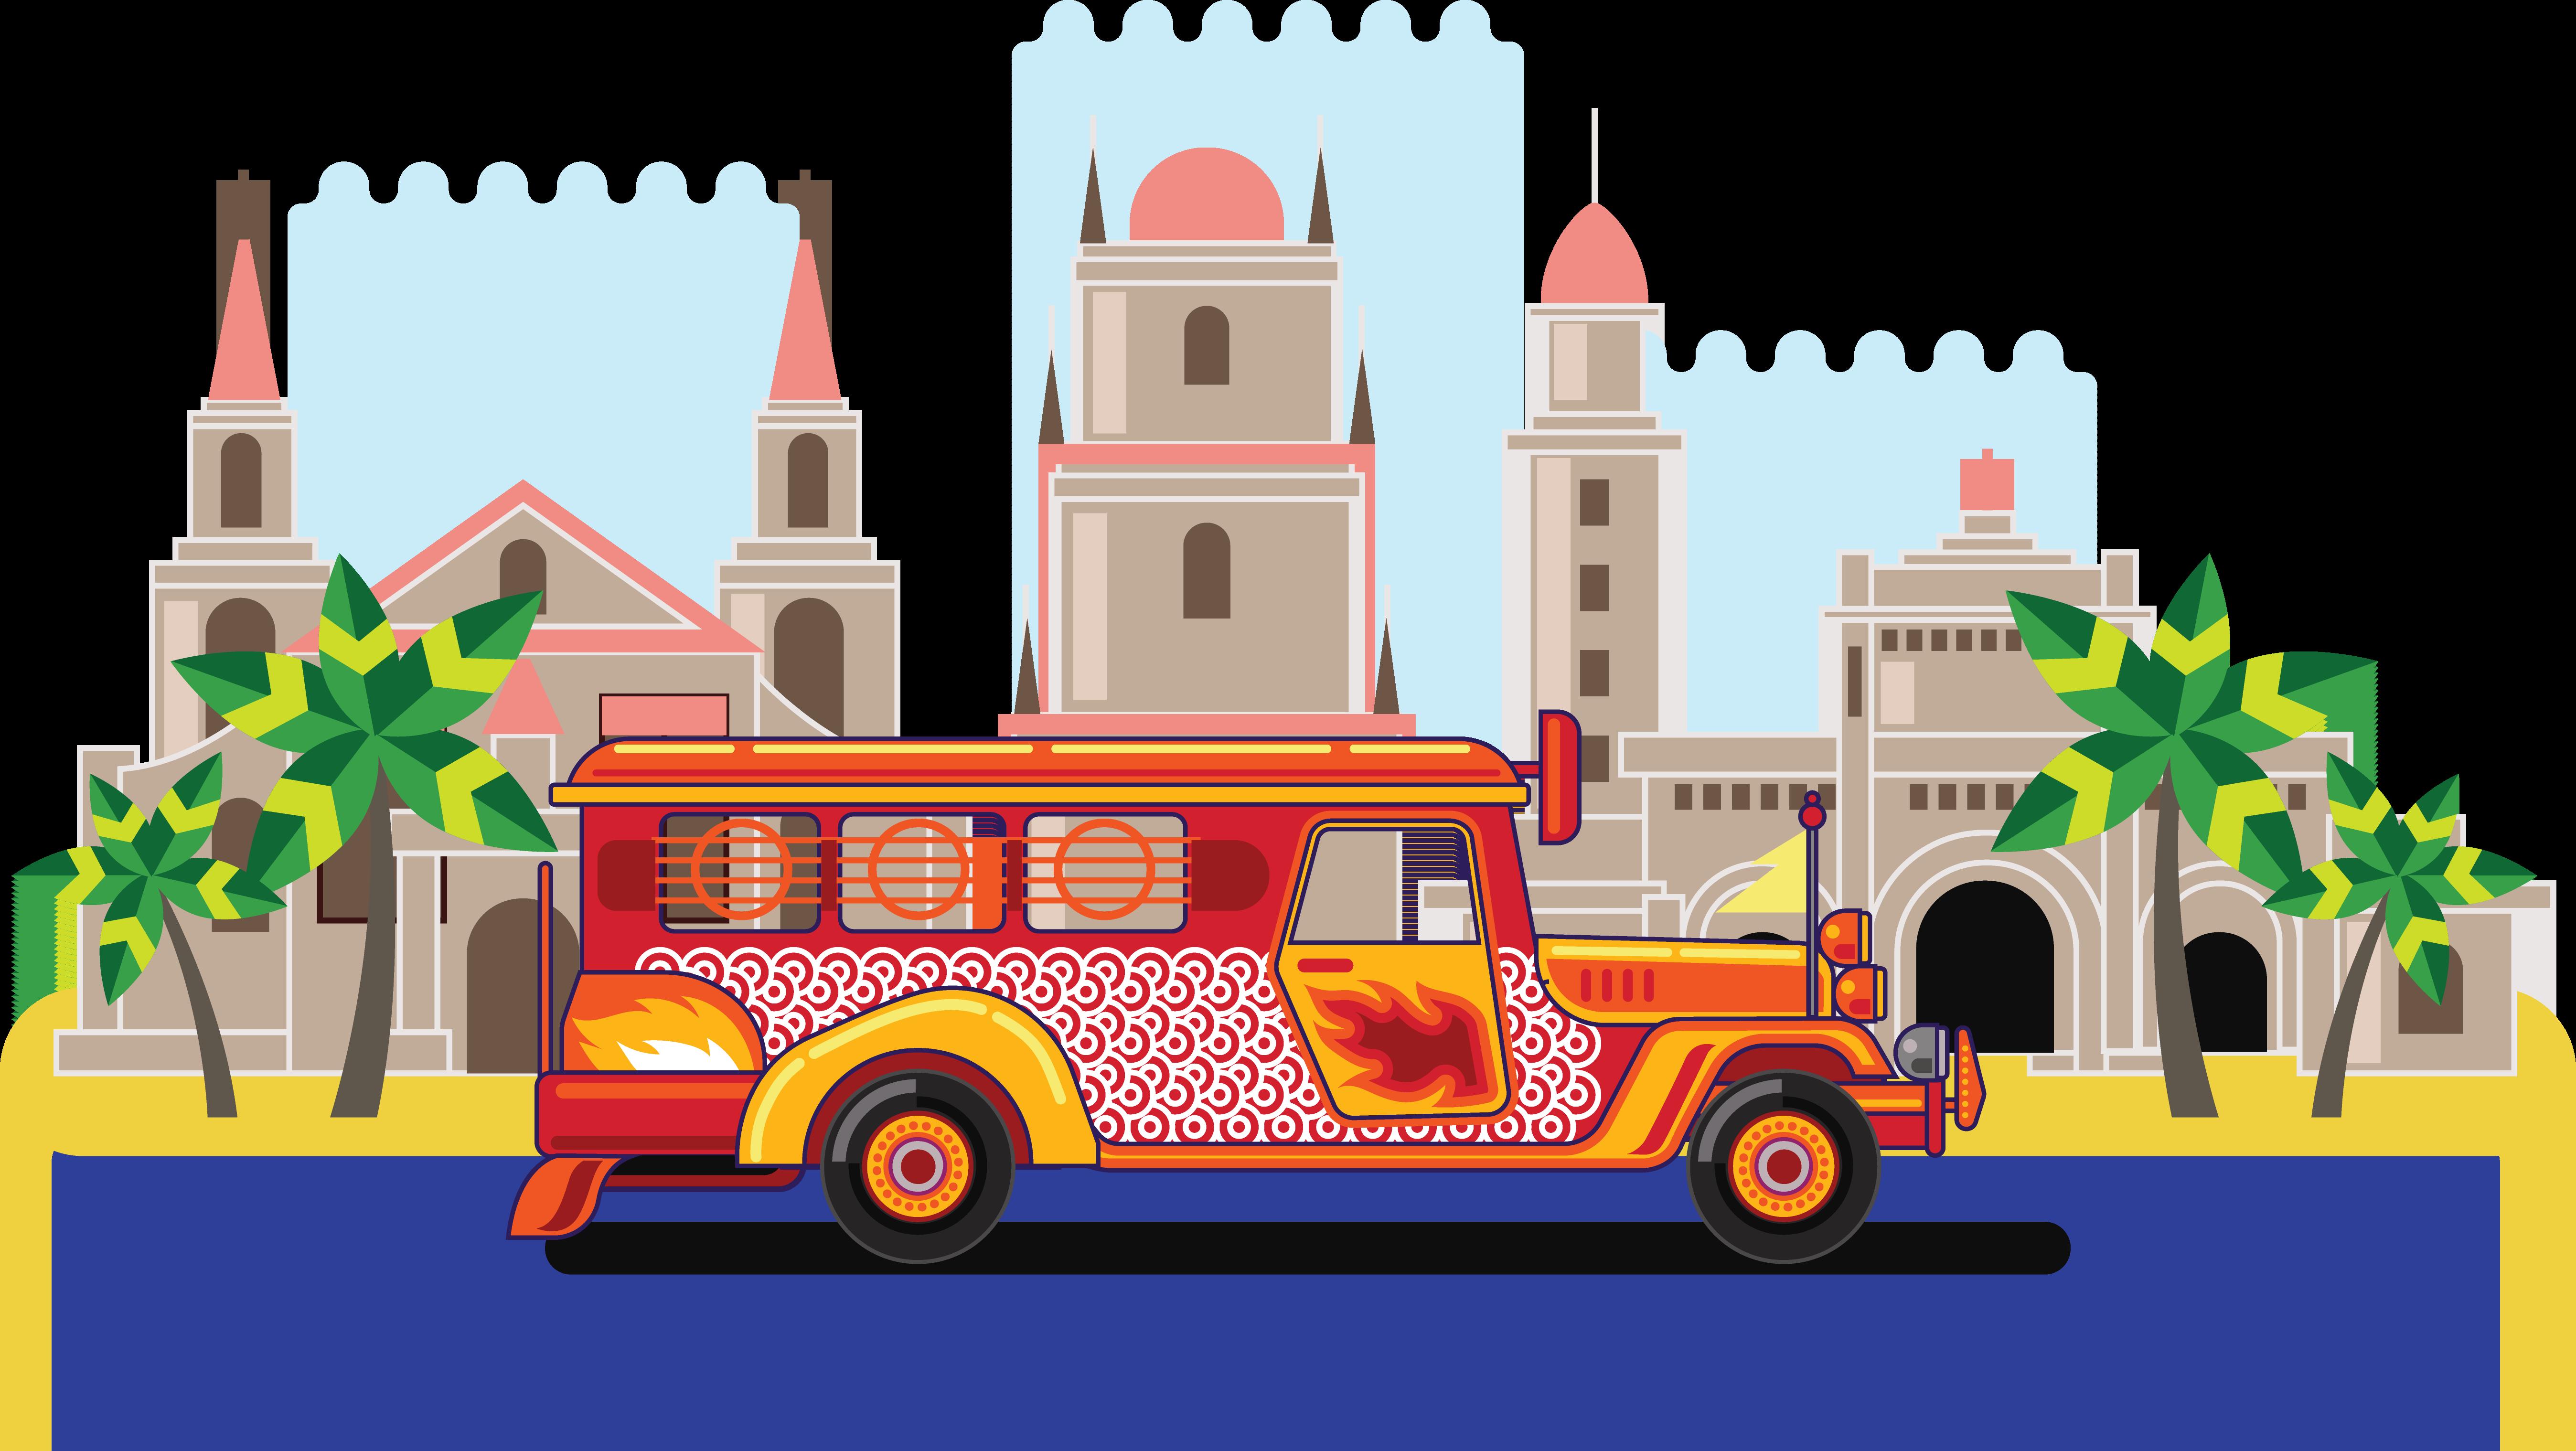 Minivan clipart aerial car. Best travel agency in